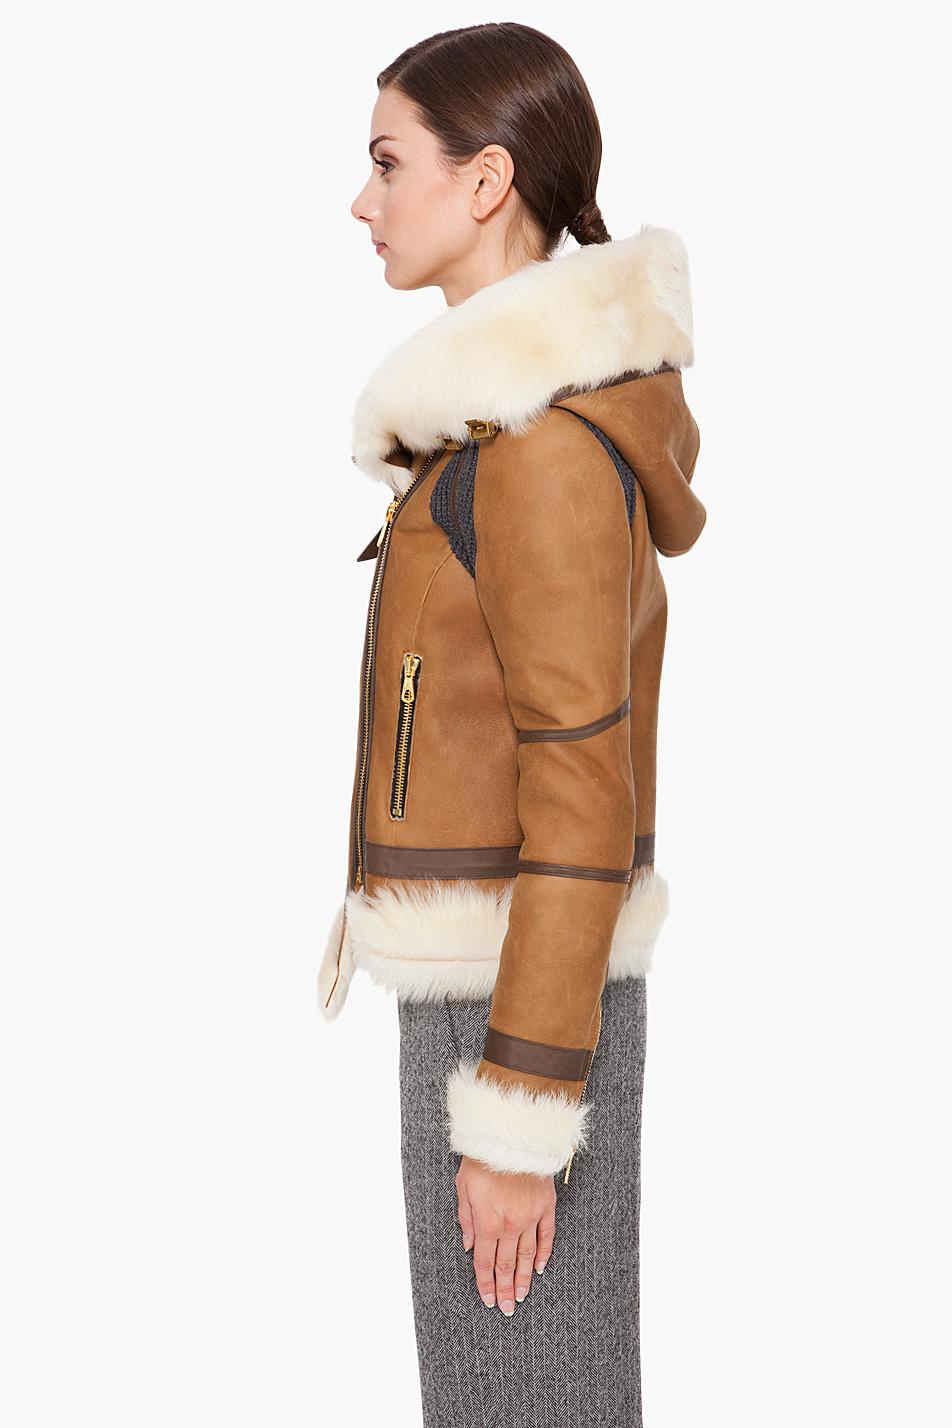 Rag & Bone Preorder Shoreditch Shearling Jacket In Tan